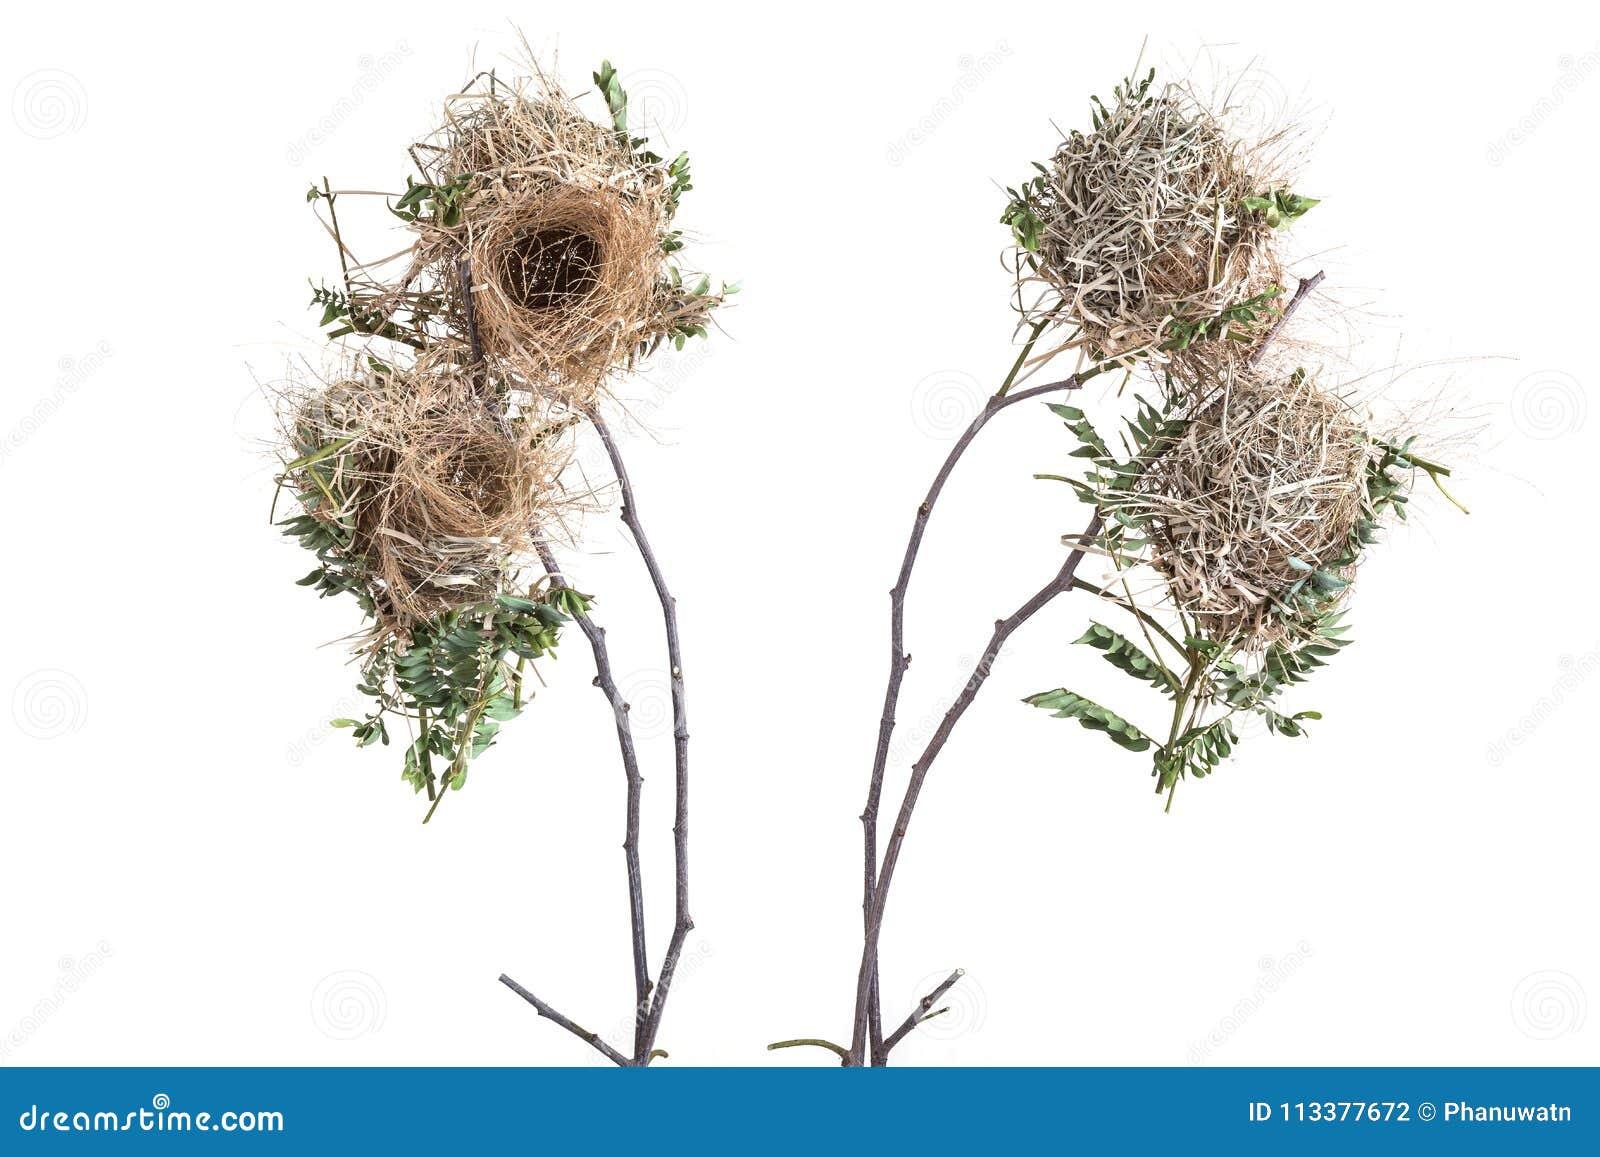 Gammalt tomt brunt fågelrede på torr trädfilial studioskottisolat